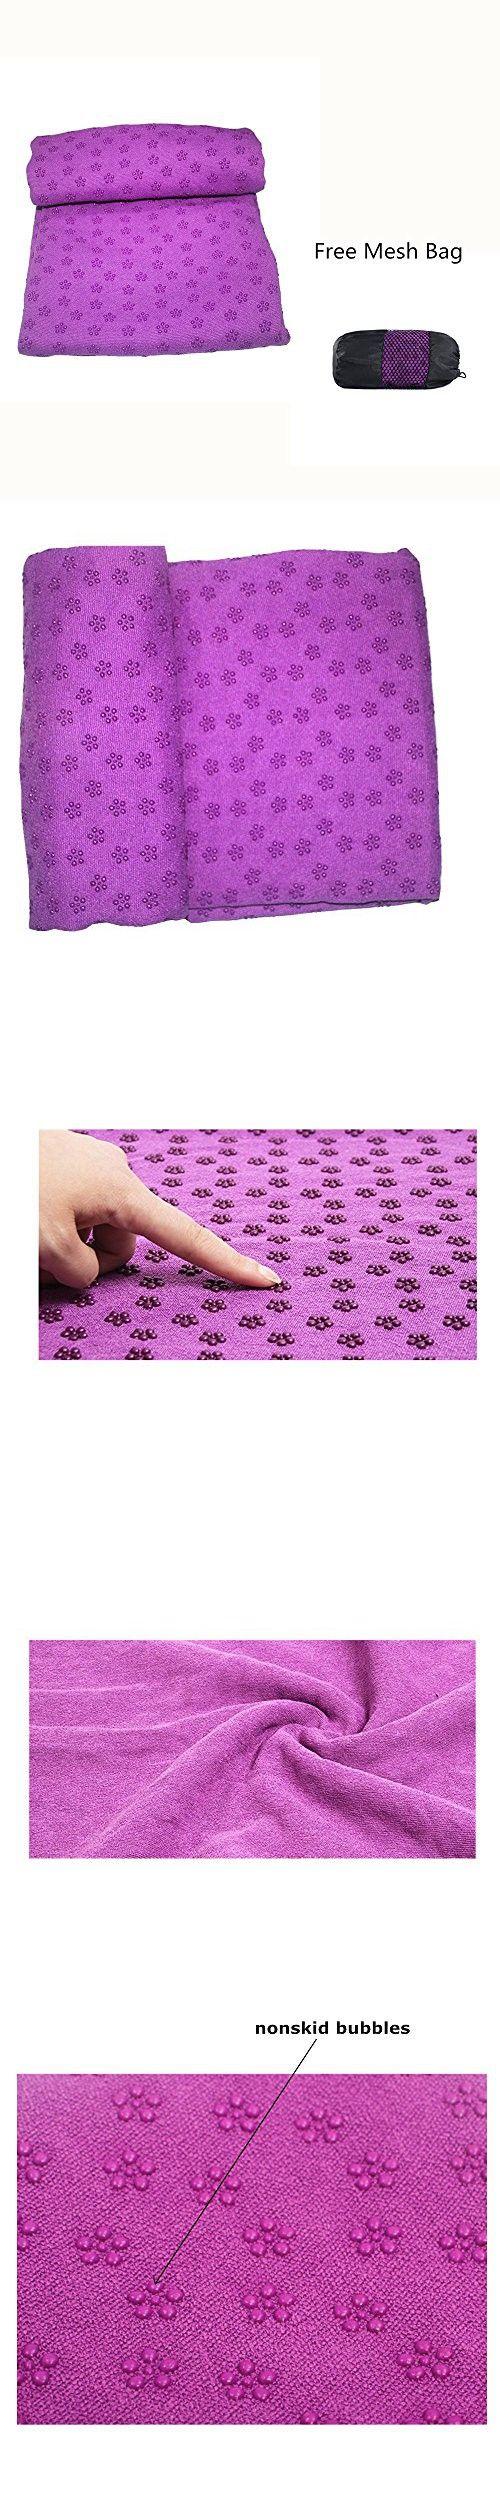 YL trd Microfiber Non Slip Hot Yoga Towel with Anti-slip Rubber Particles (Purple)